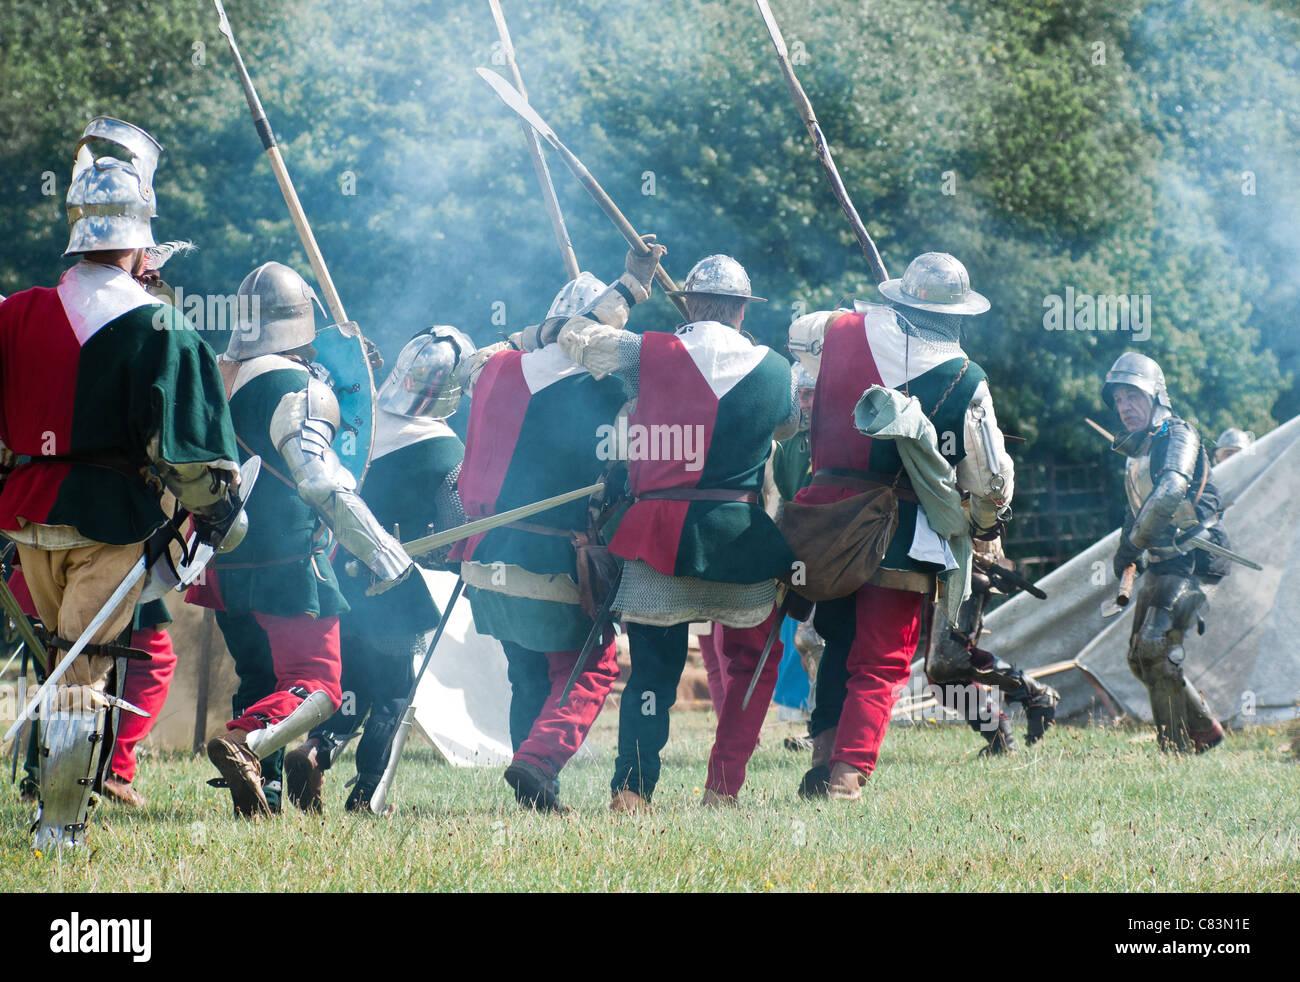 Medieval Polearm Stock Photos & Medieval Polearm Stock Images - Alamy